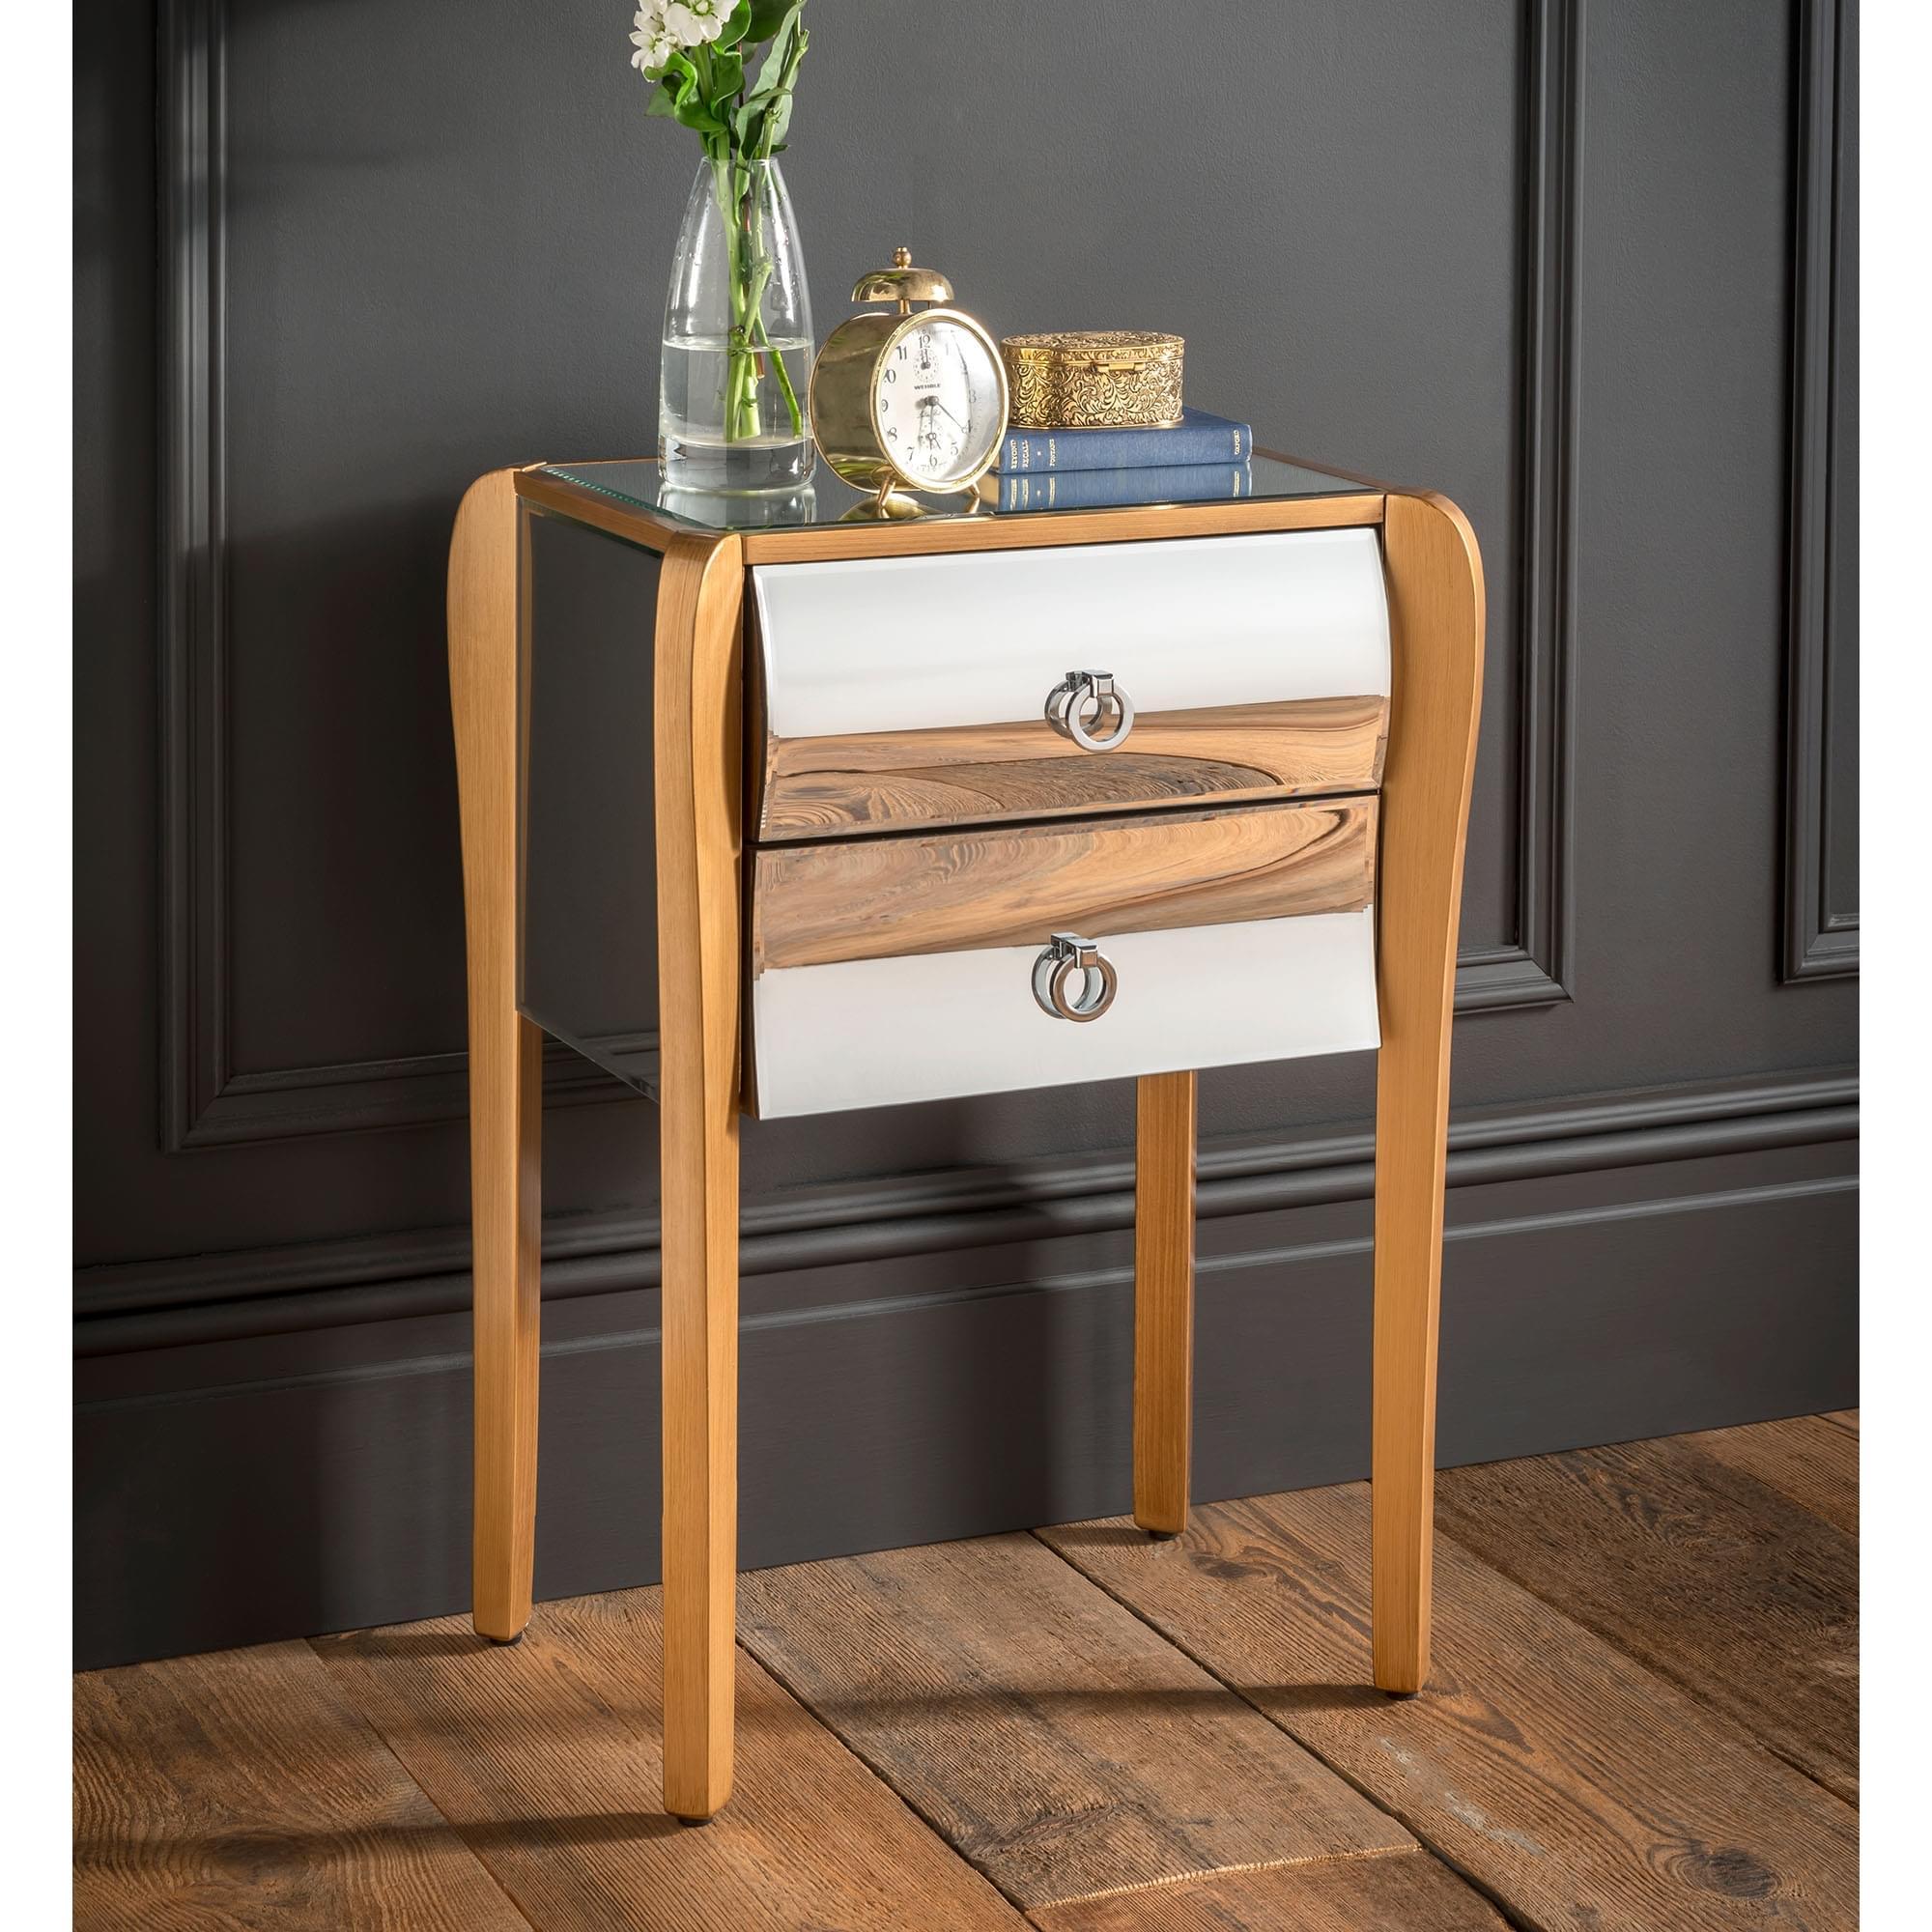 online retailer 1e165 8fc55 Paris Mirrored Bedside Table